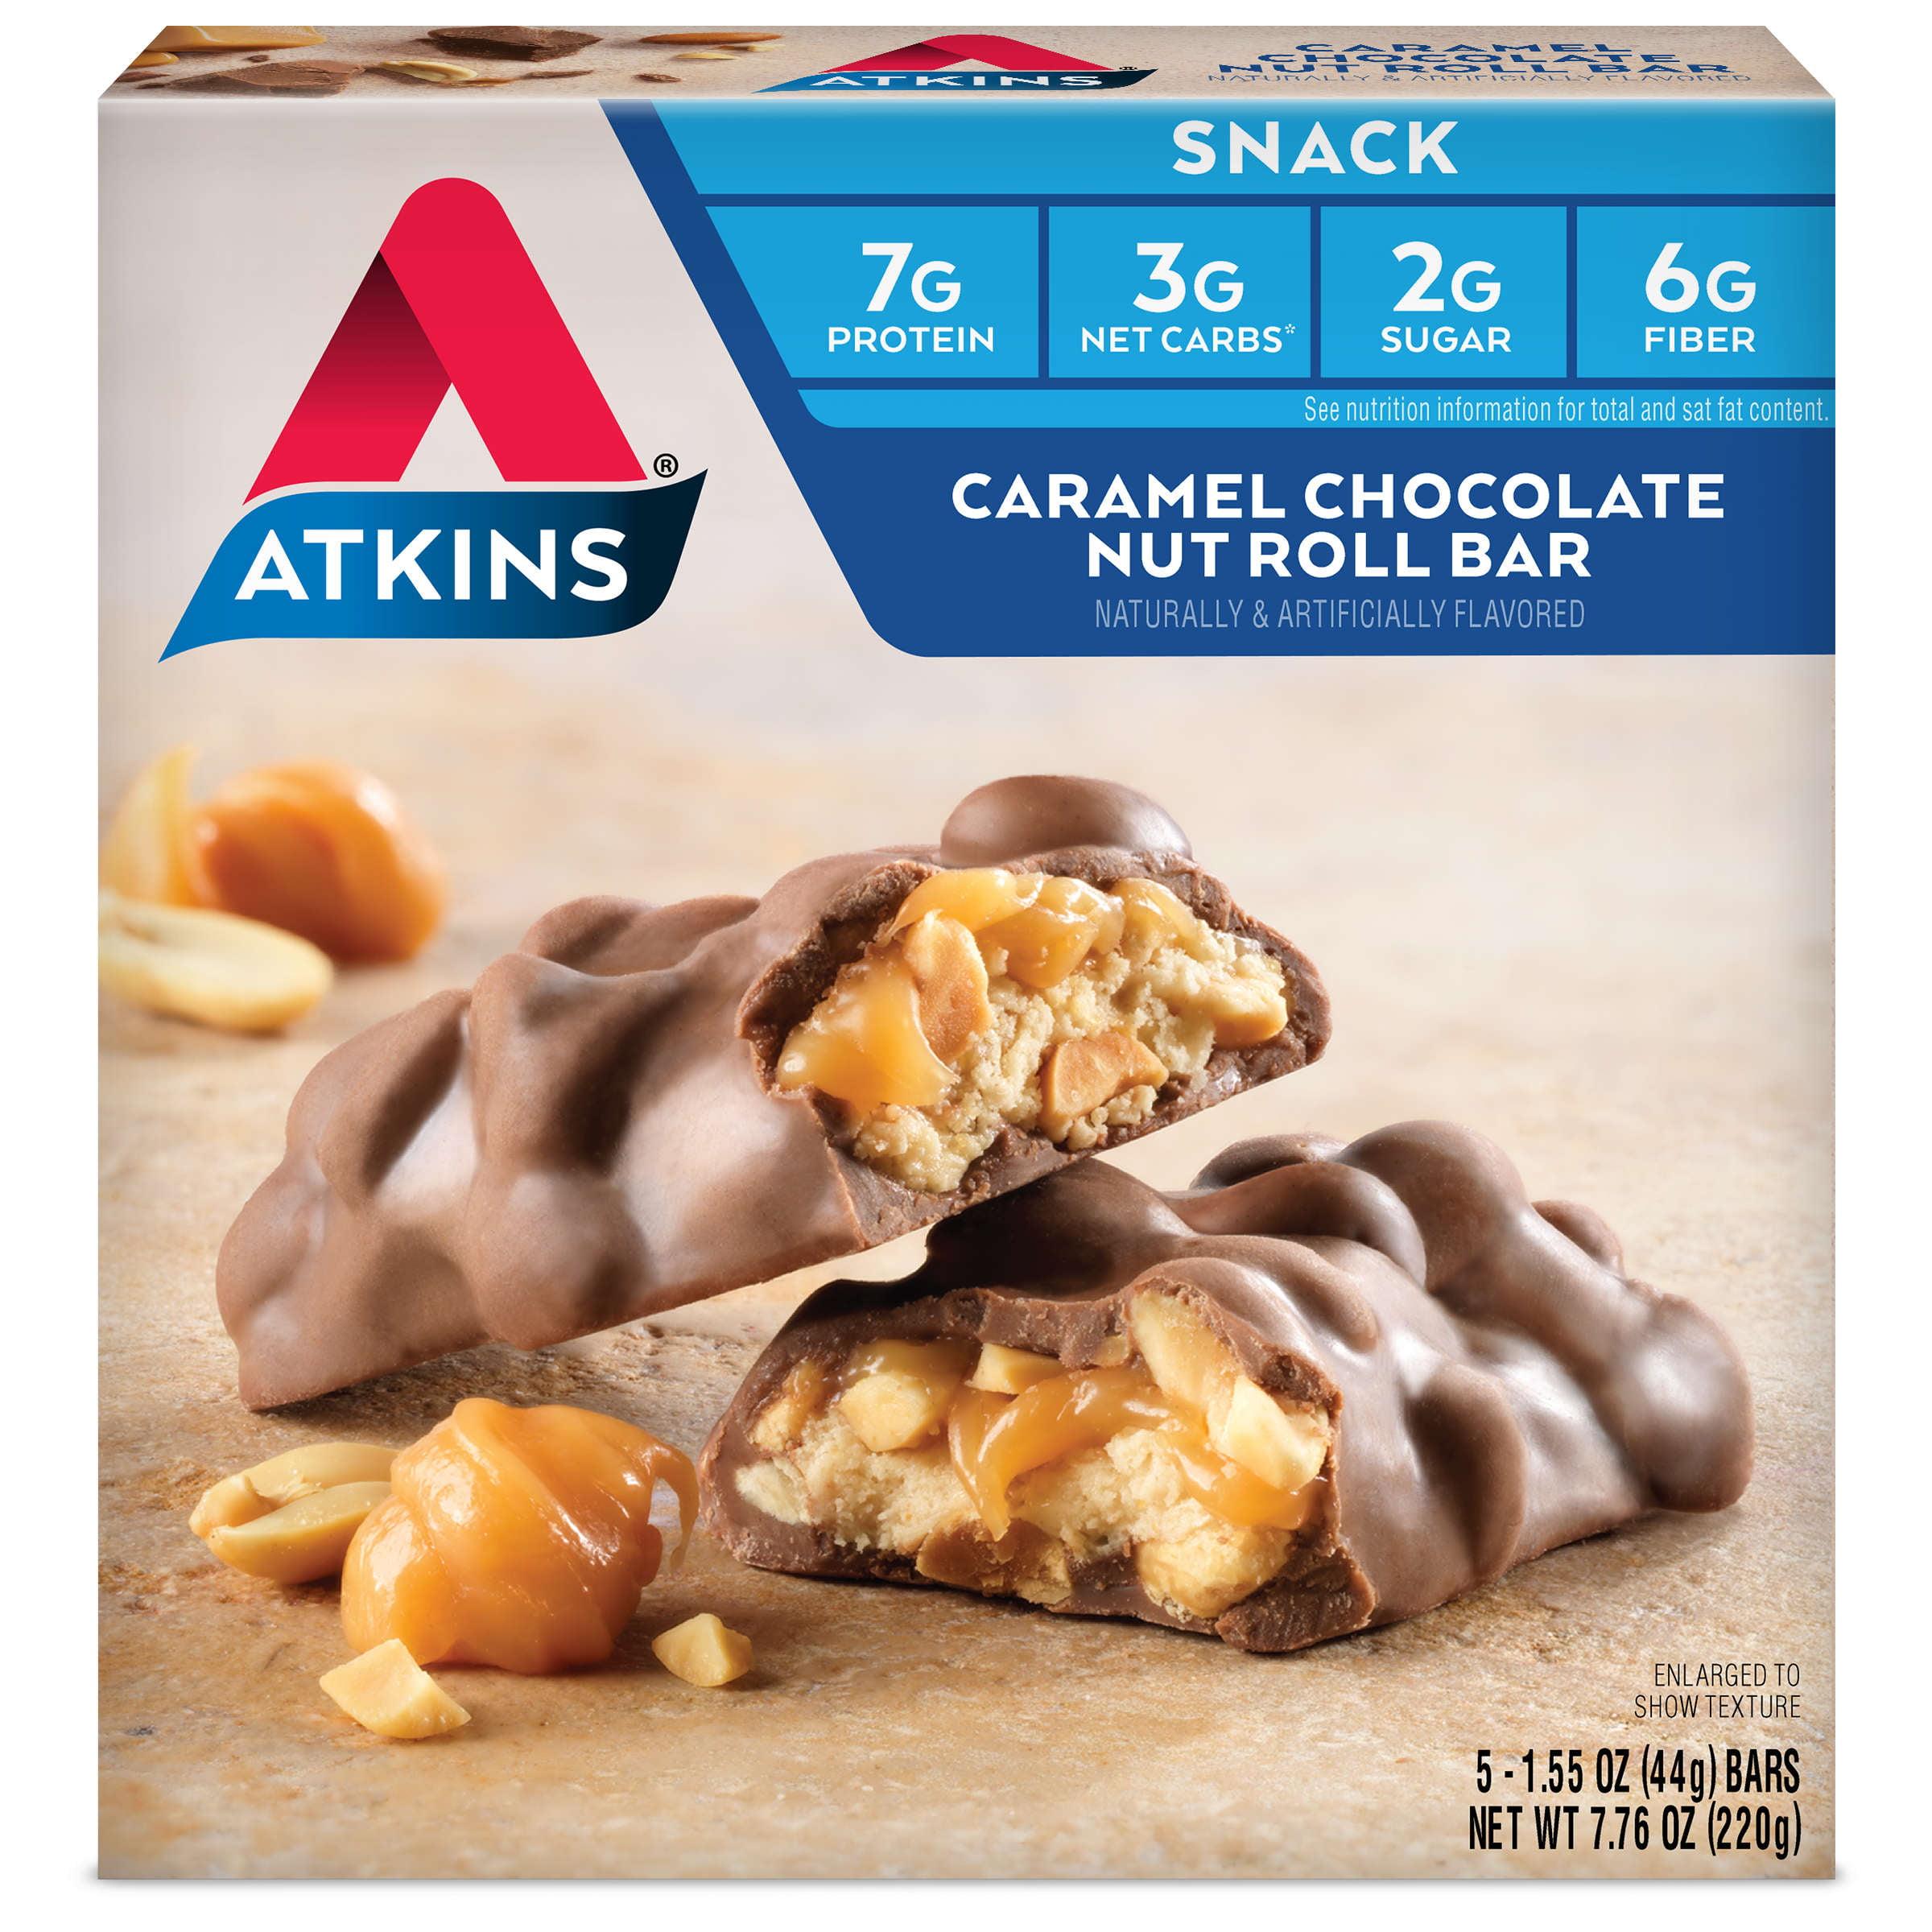 Chocolate nut roll